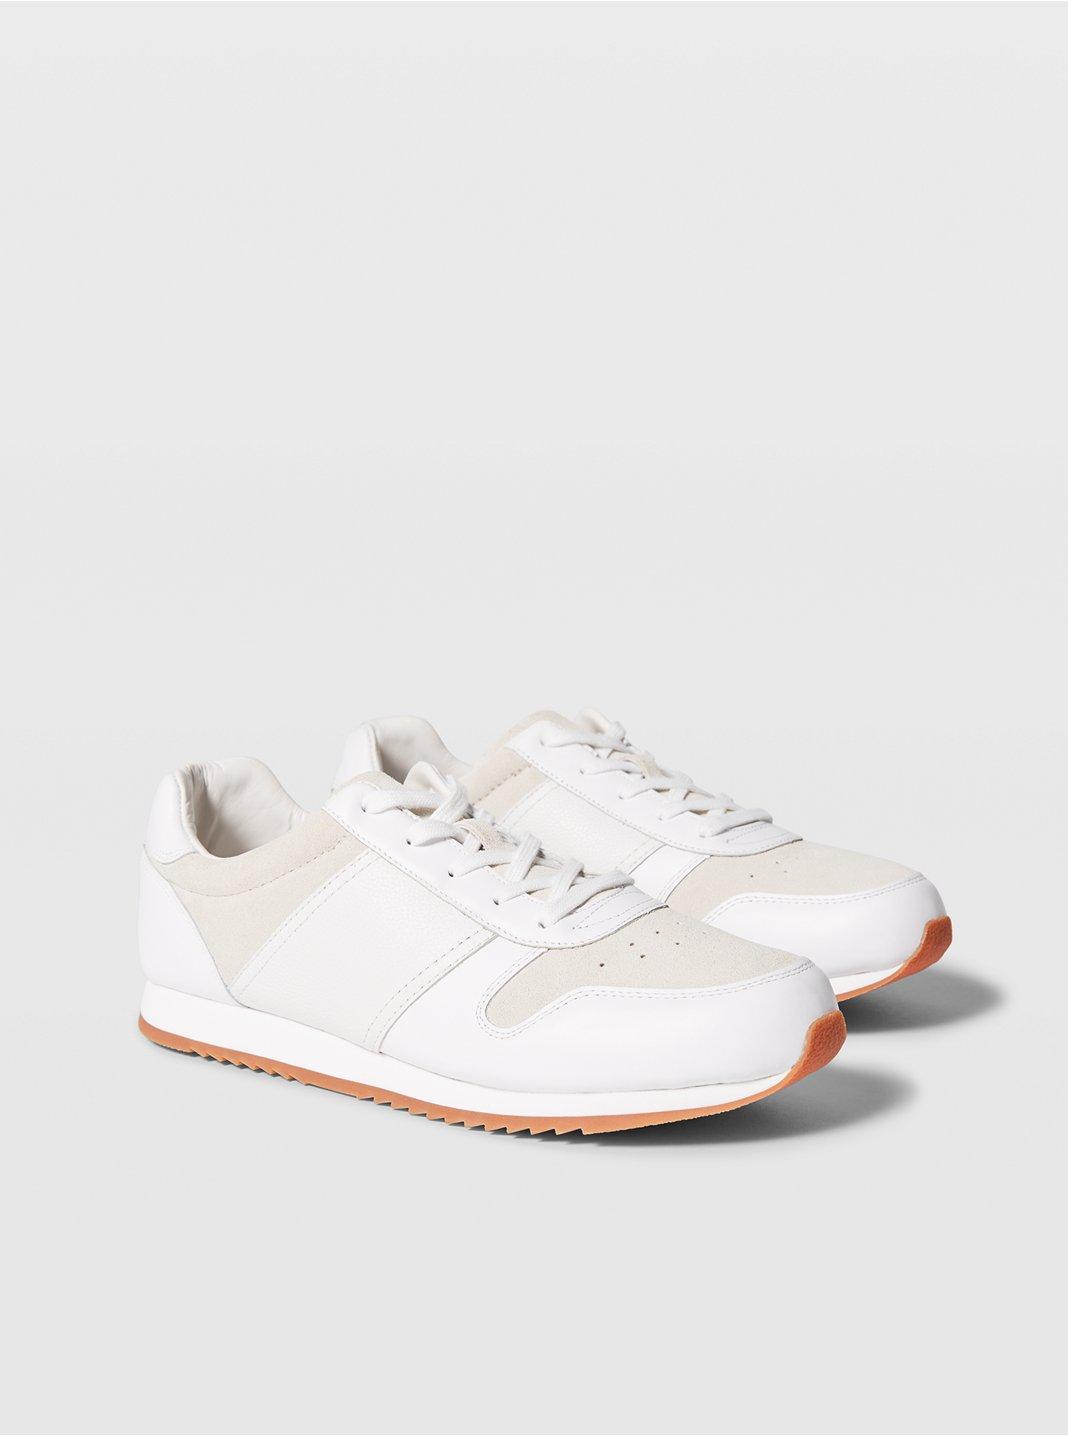 Club Monaco Runner Sneaker